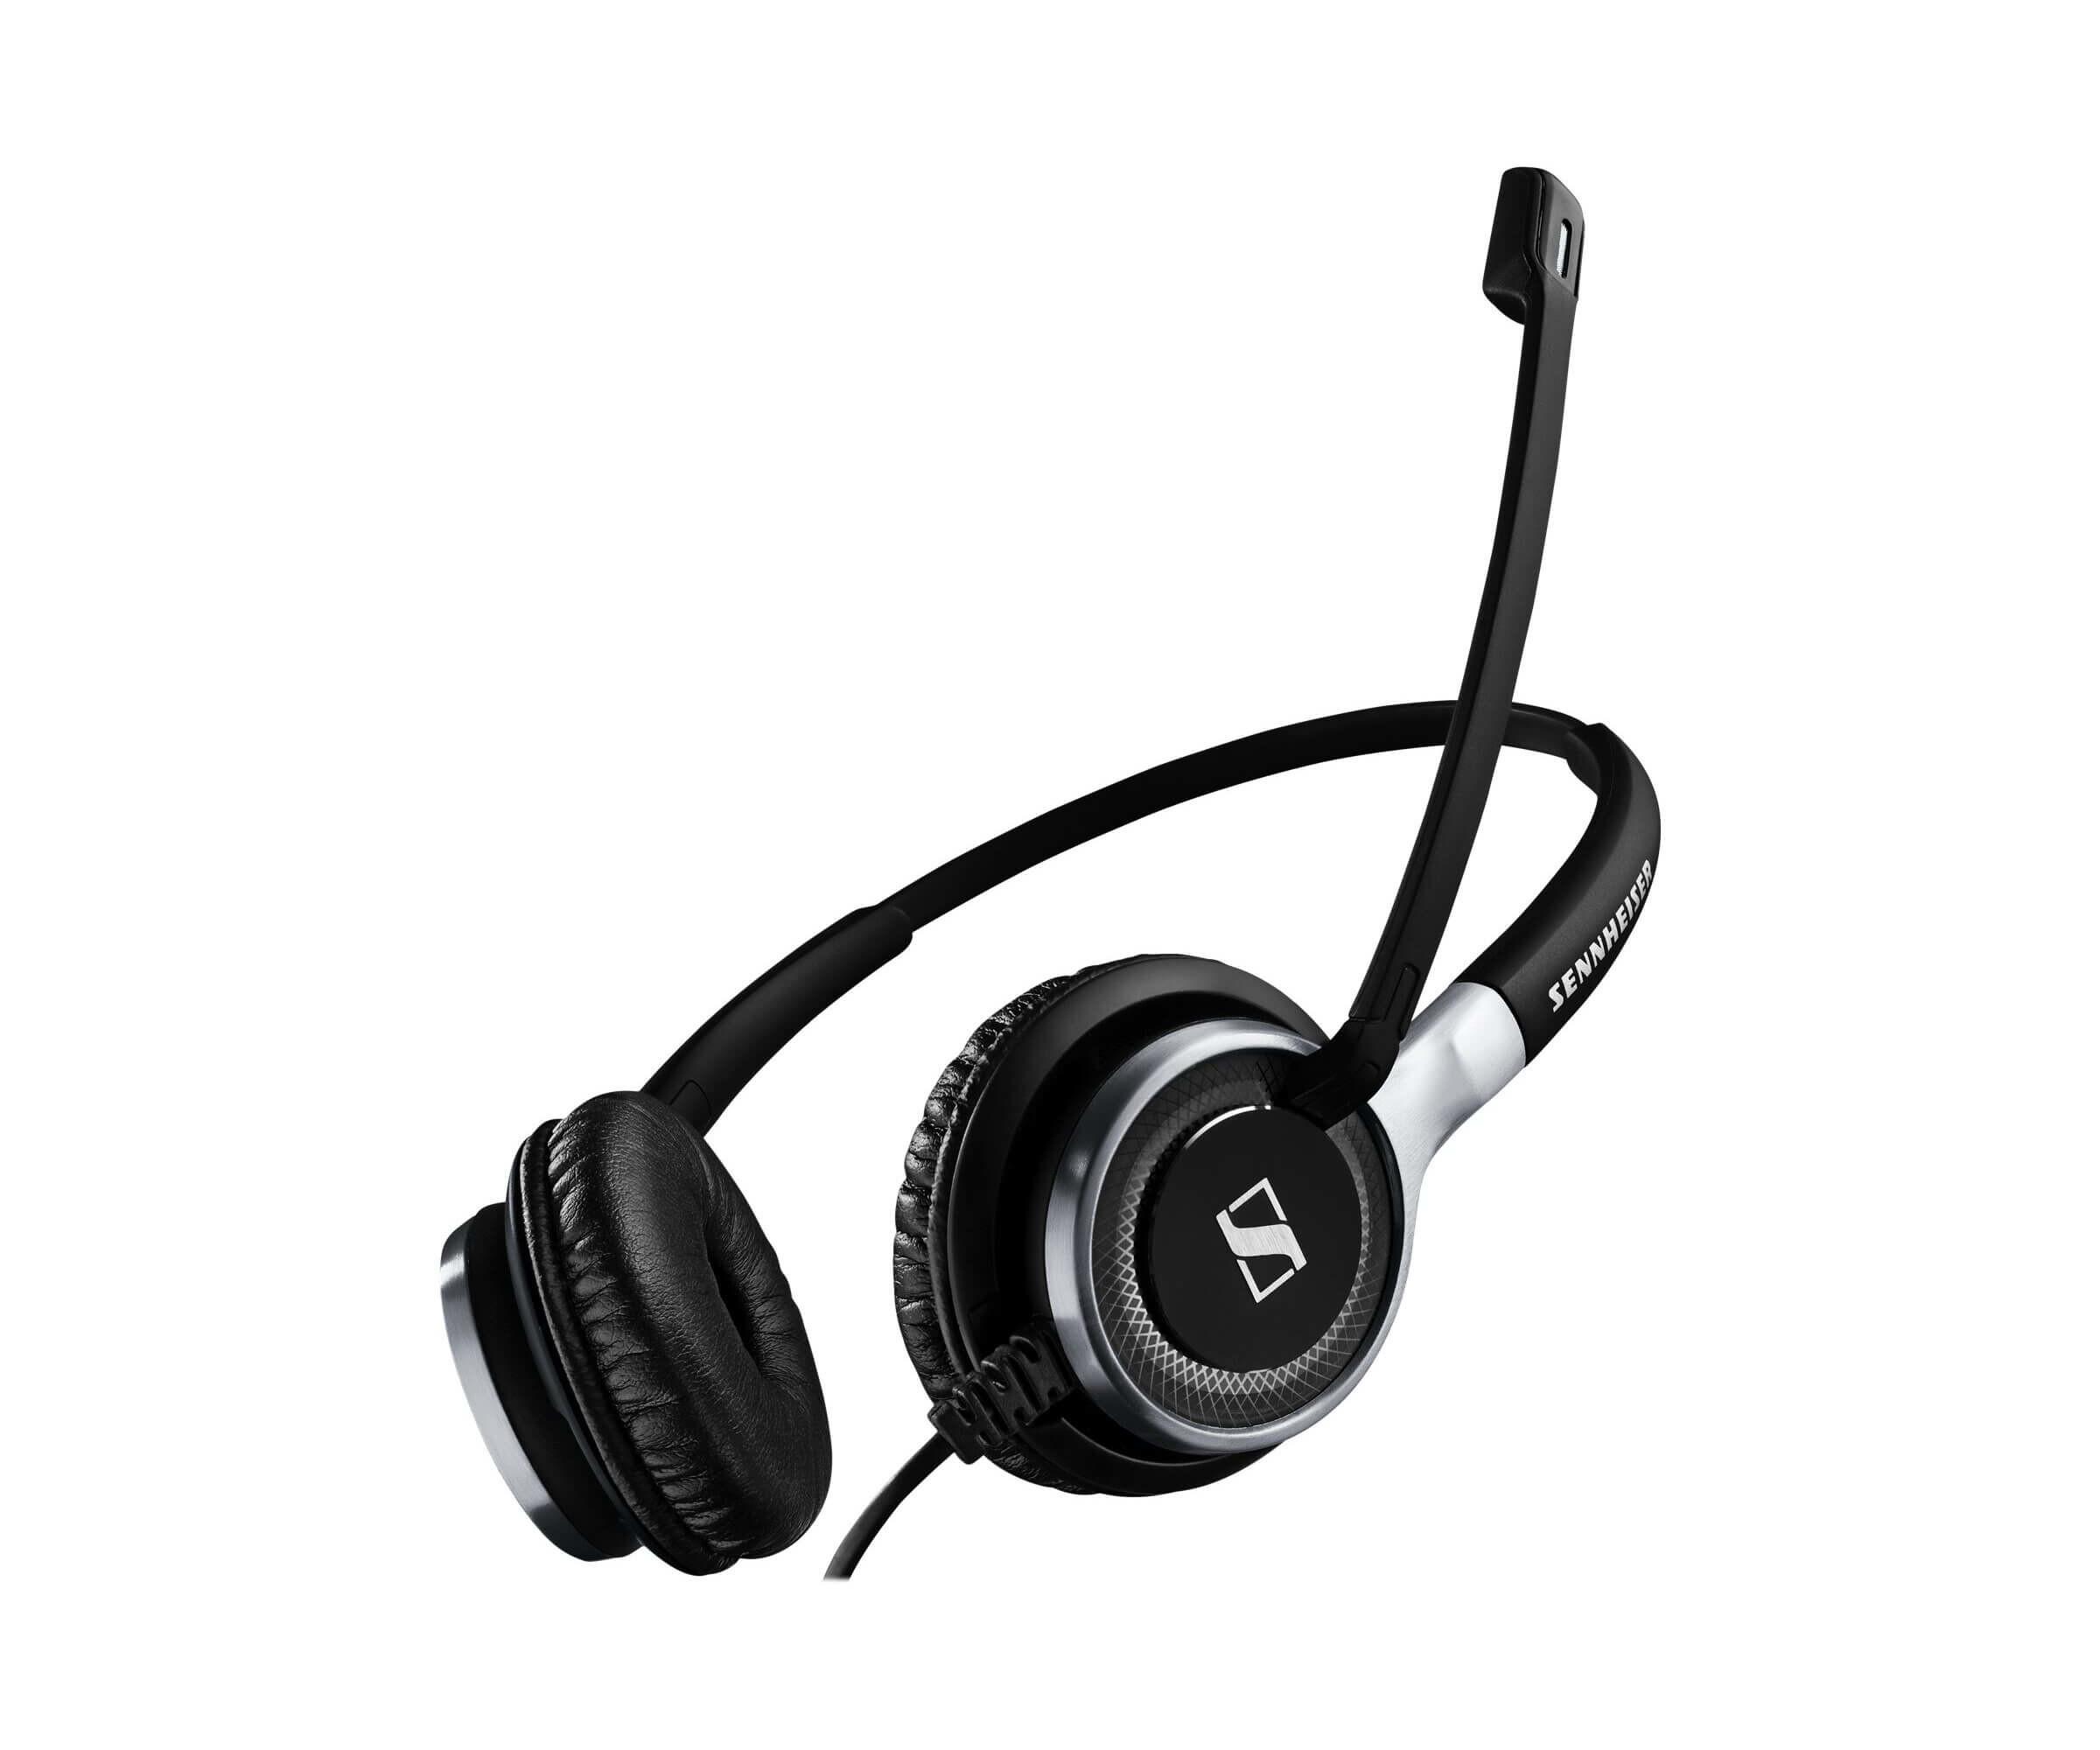 headphones for call center